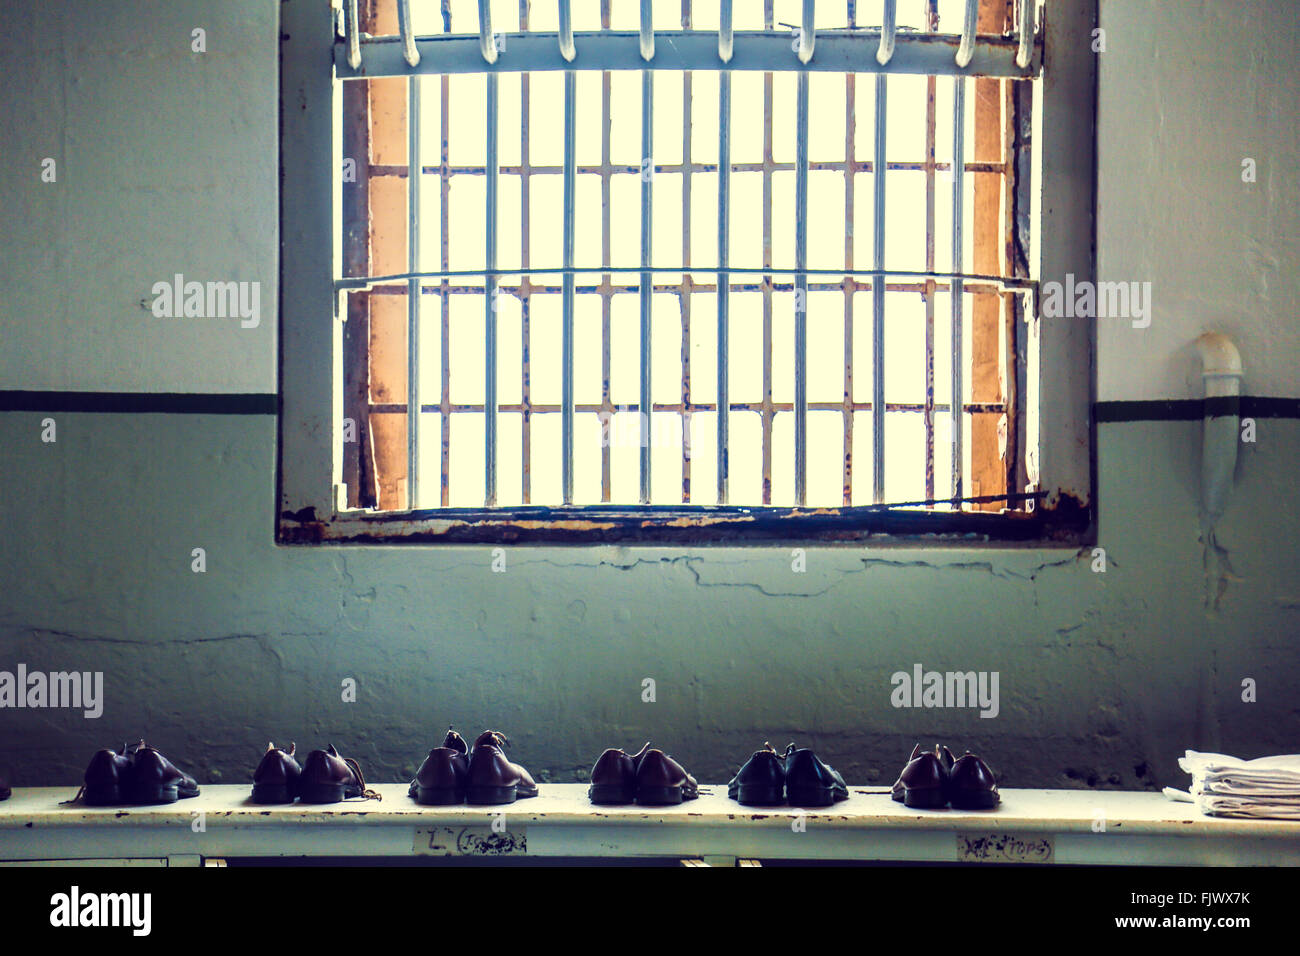 Alcatraz Prison Shoes, San Fransisco - Stock Image